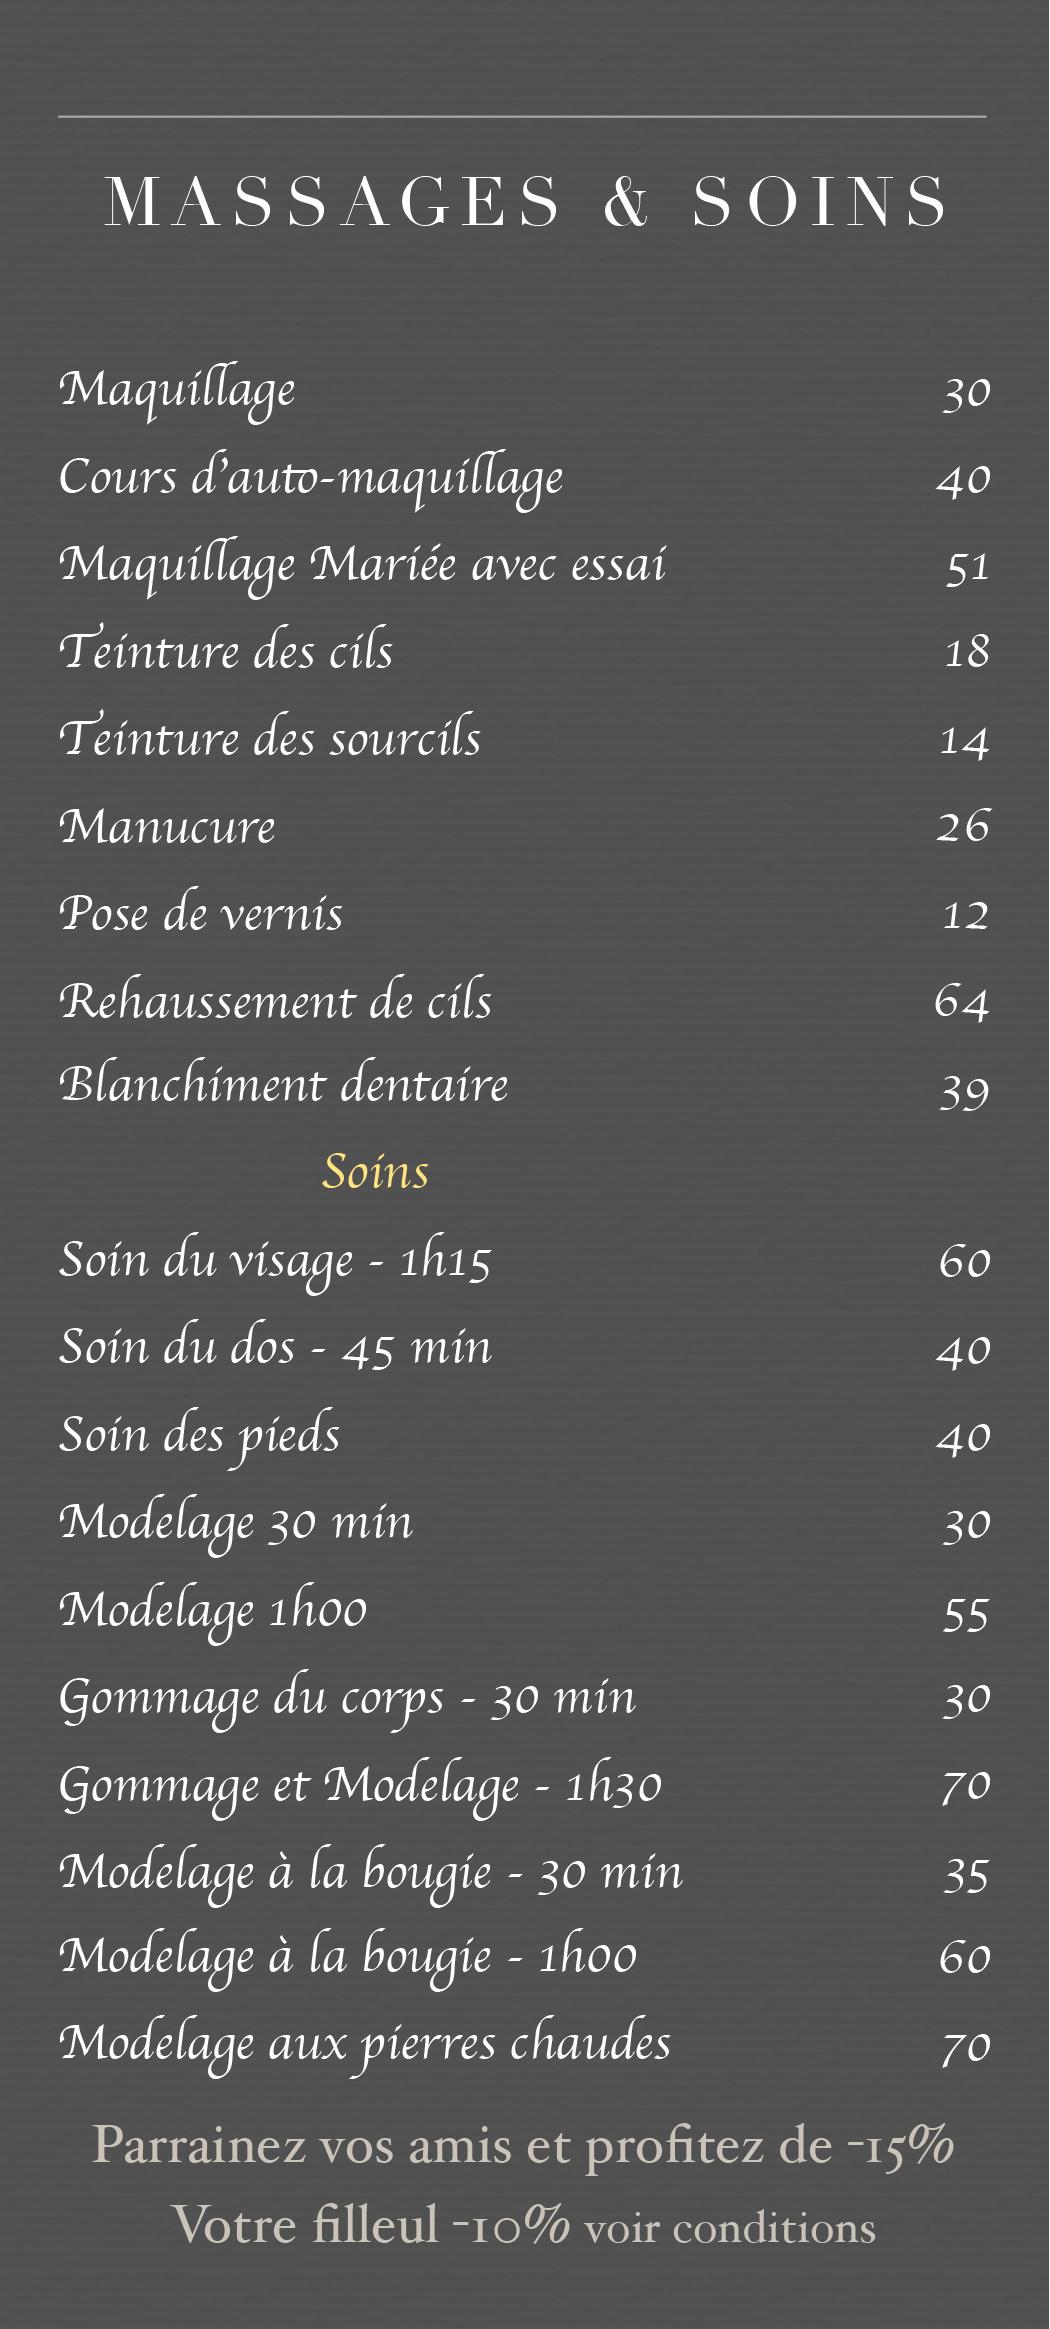 tarif-massage-soin-saint-egreve-institut